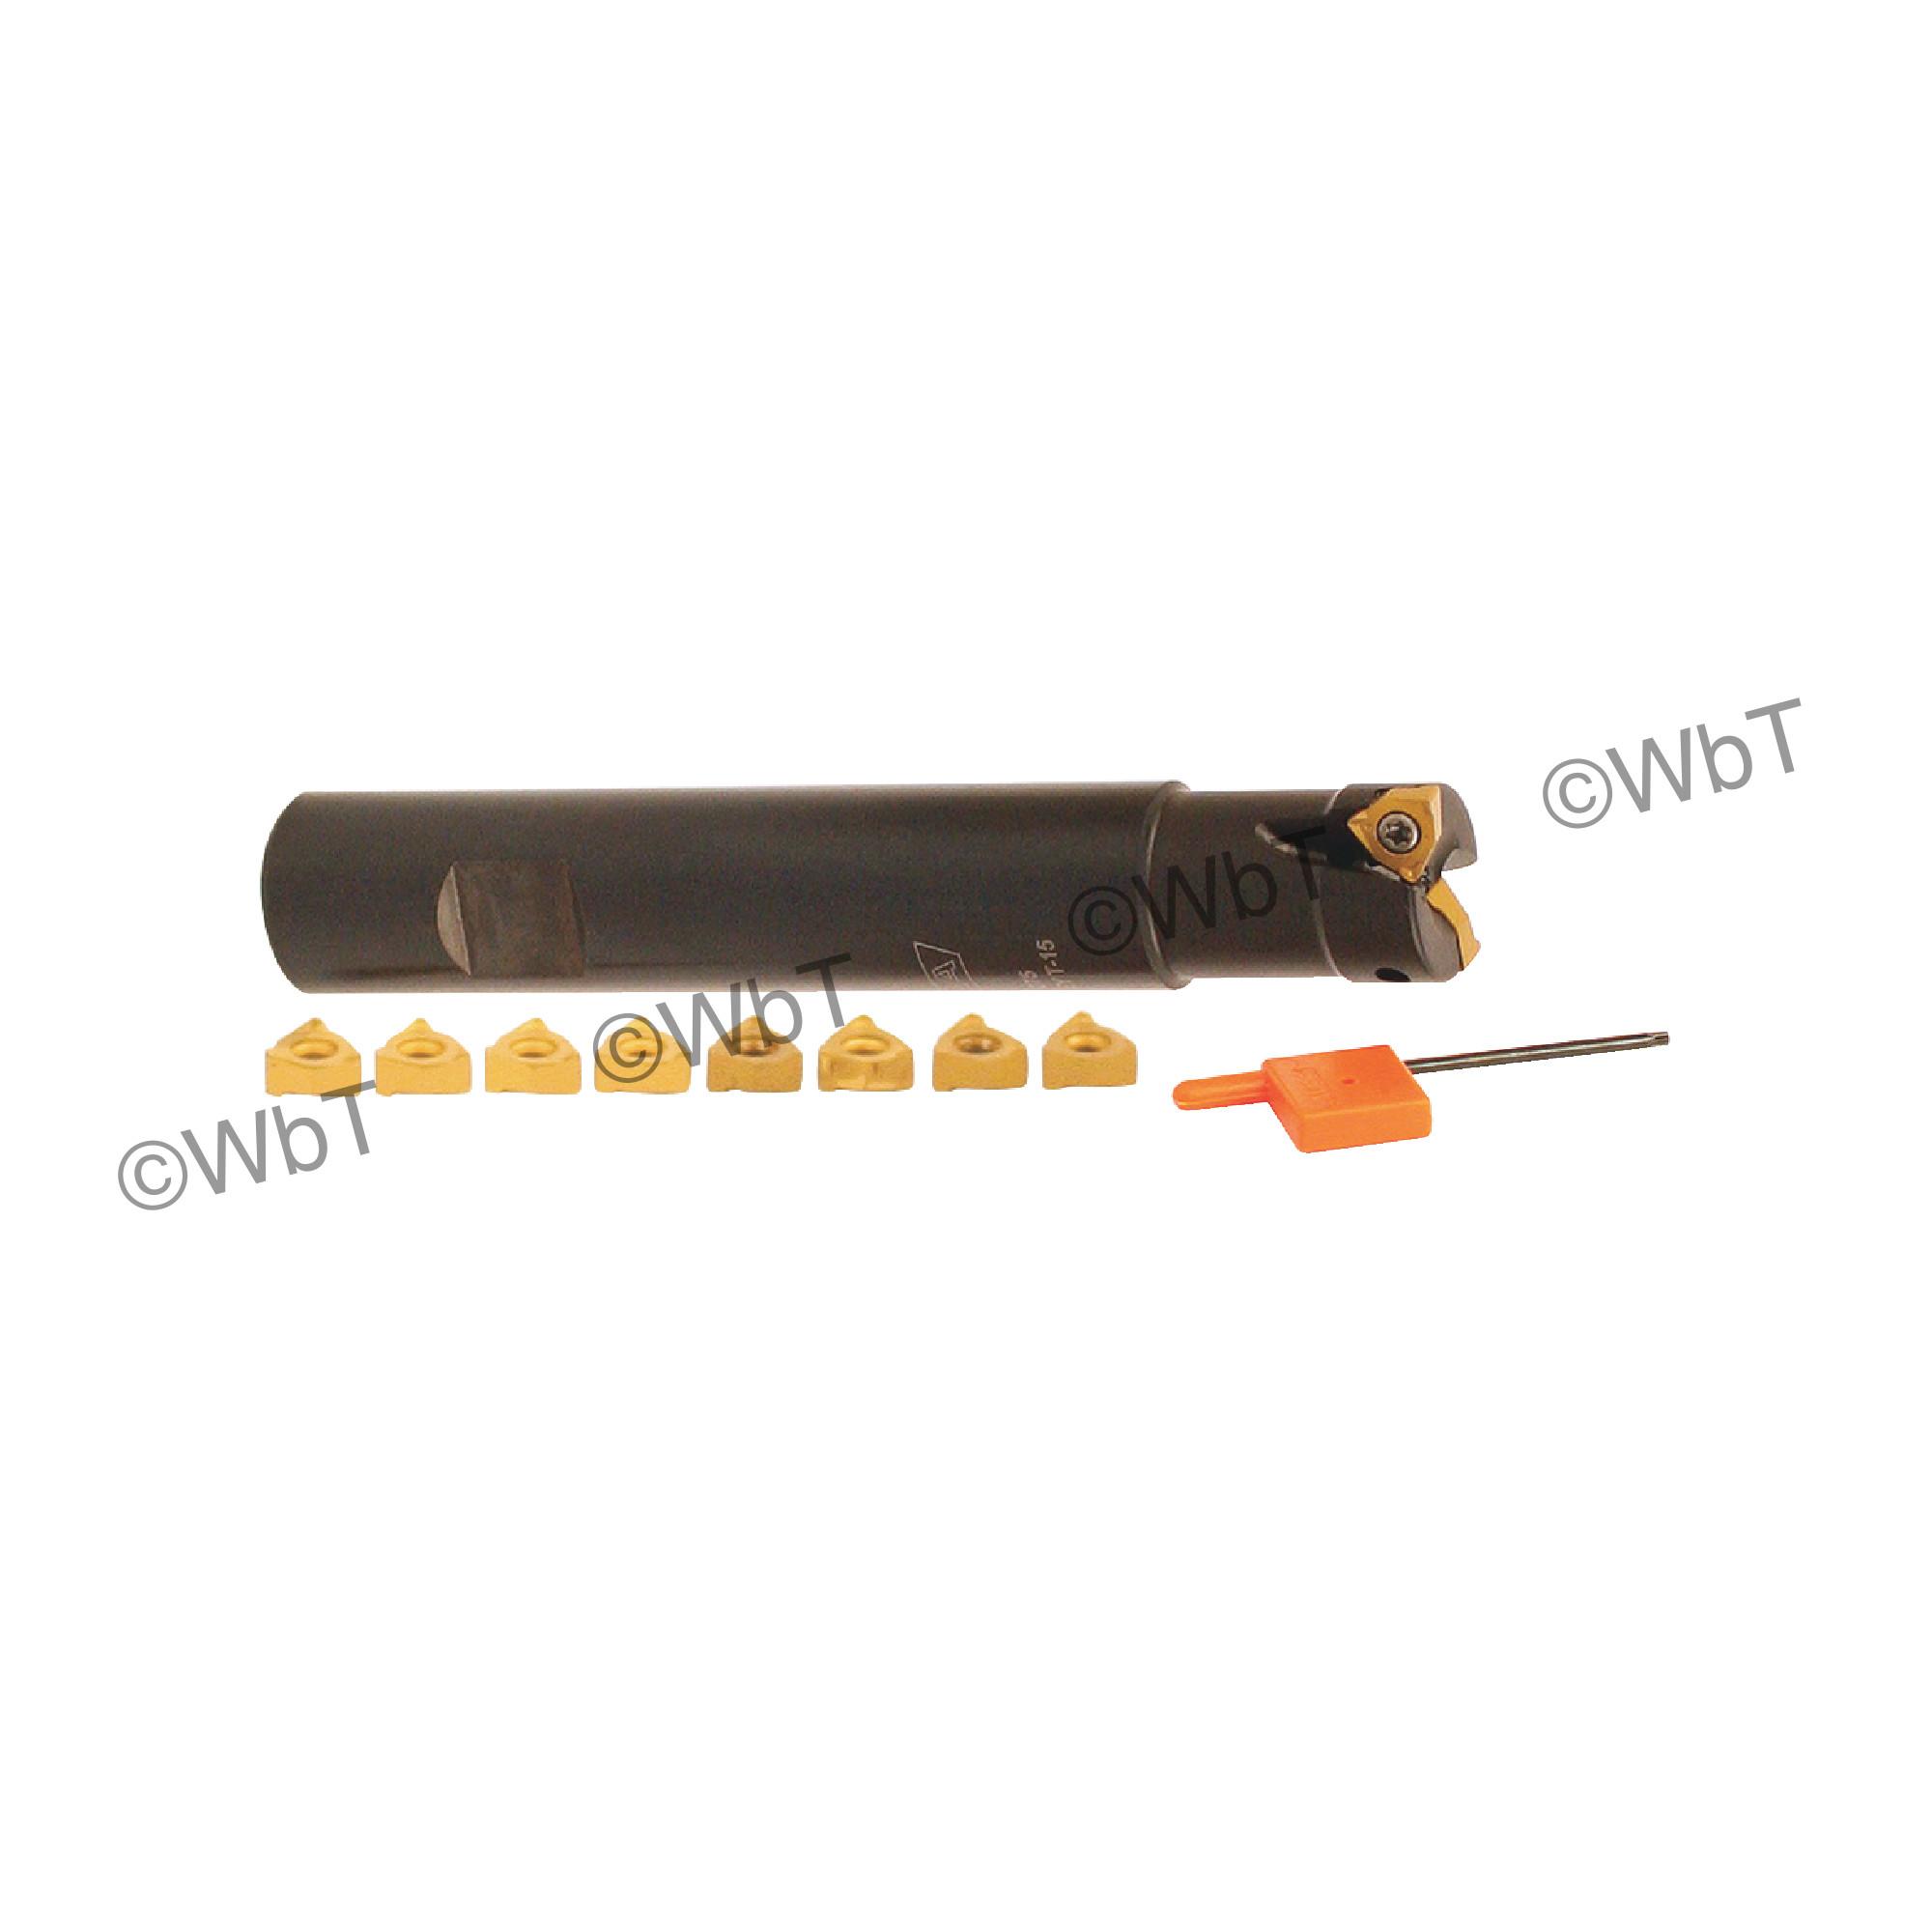 "AKUMA - 0.750"" End Mill Set with Inserts / Includes: (1) XNPS.22.075.R-S.075 (3/4"" ø) & (10) XNEX221R-M1 CM30P Co"